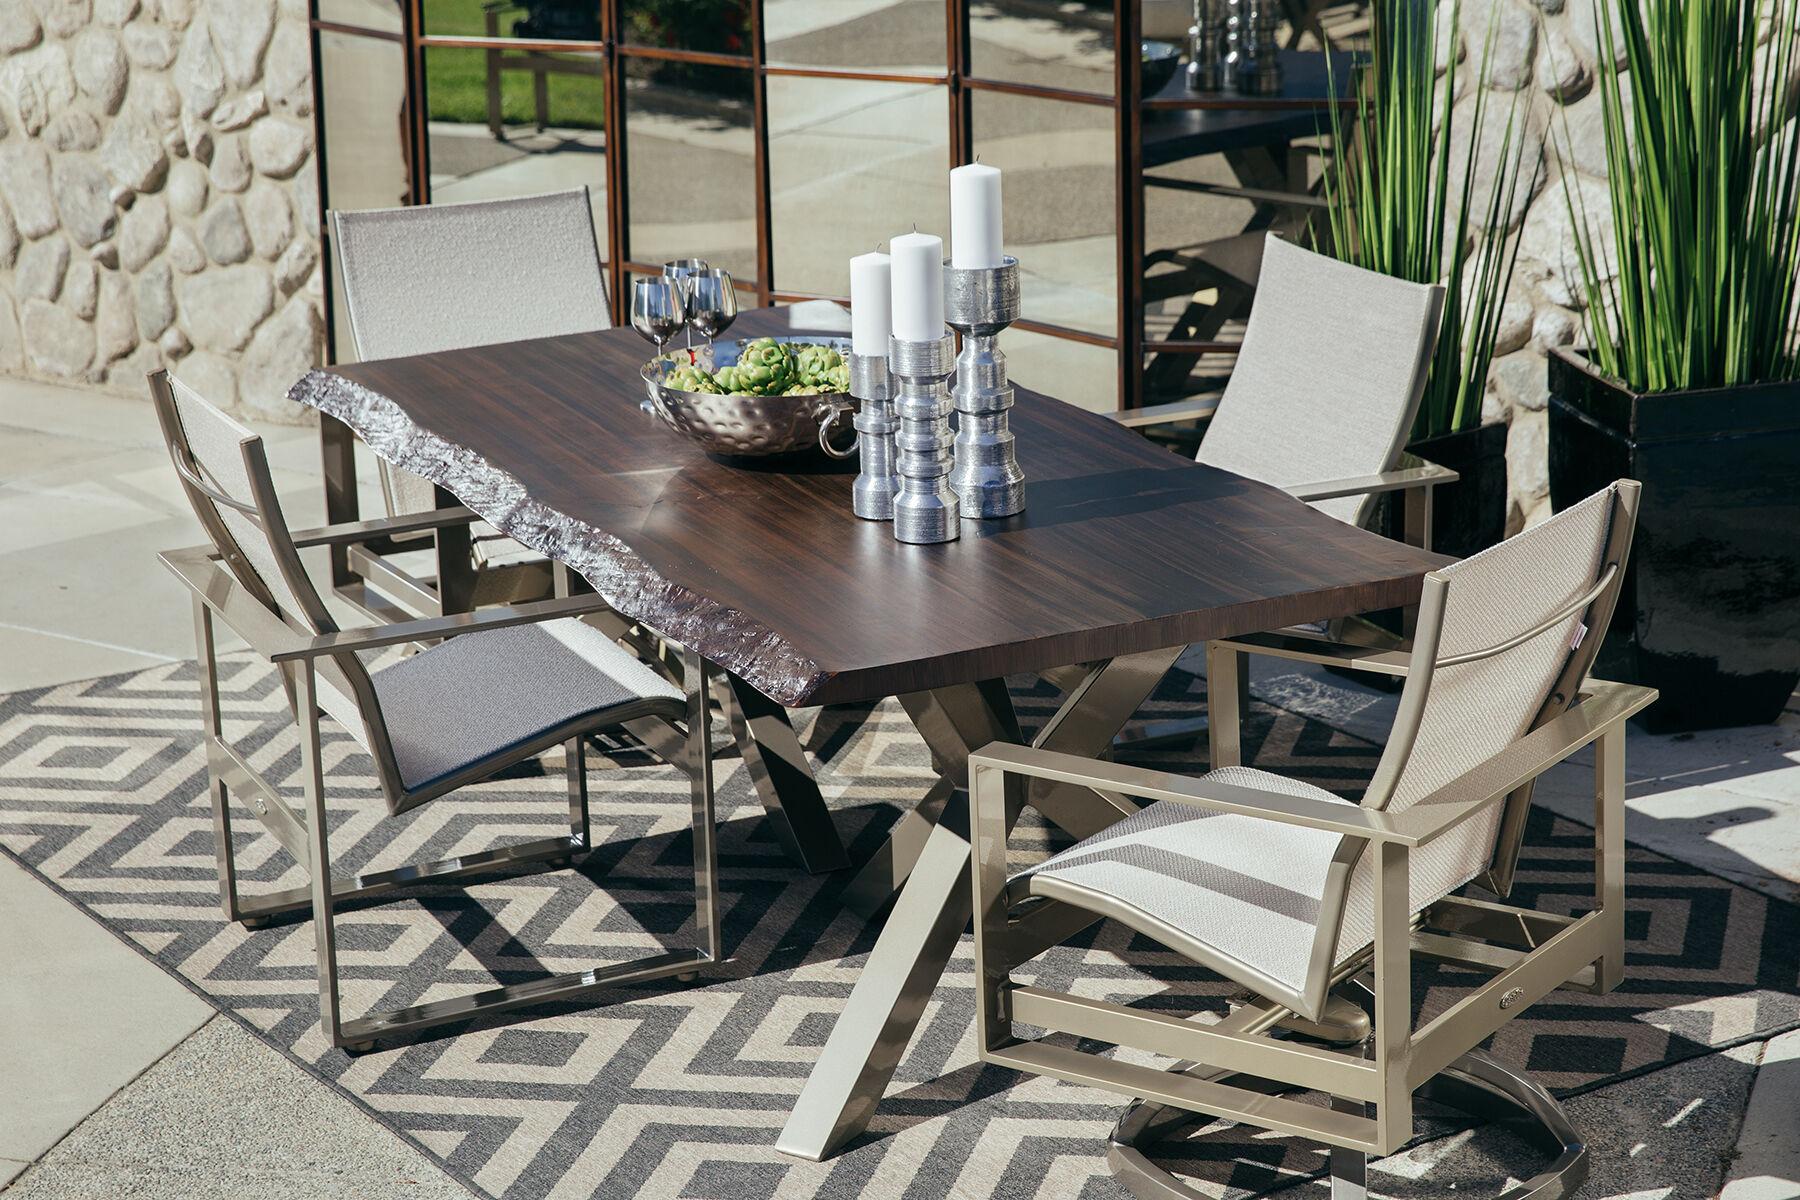 Tripod Pedestal Aluminum Rectangular Dining Tableu0026nbsp;in Dark Brown